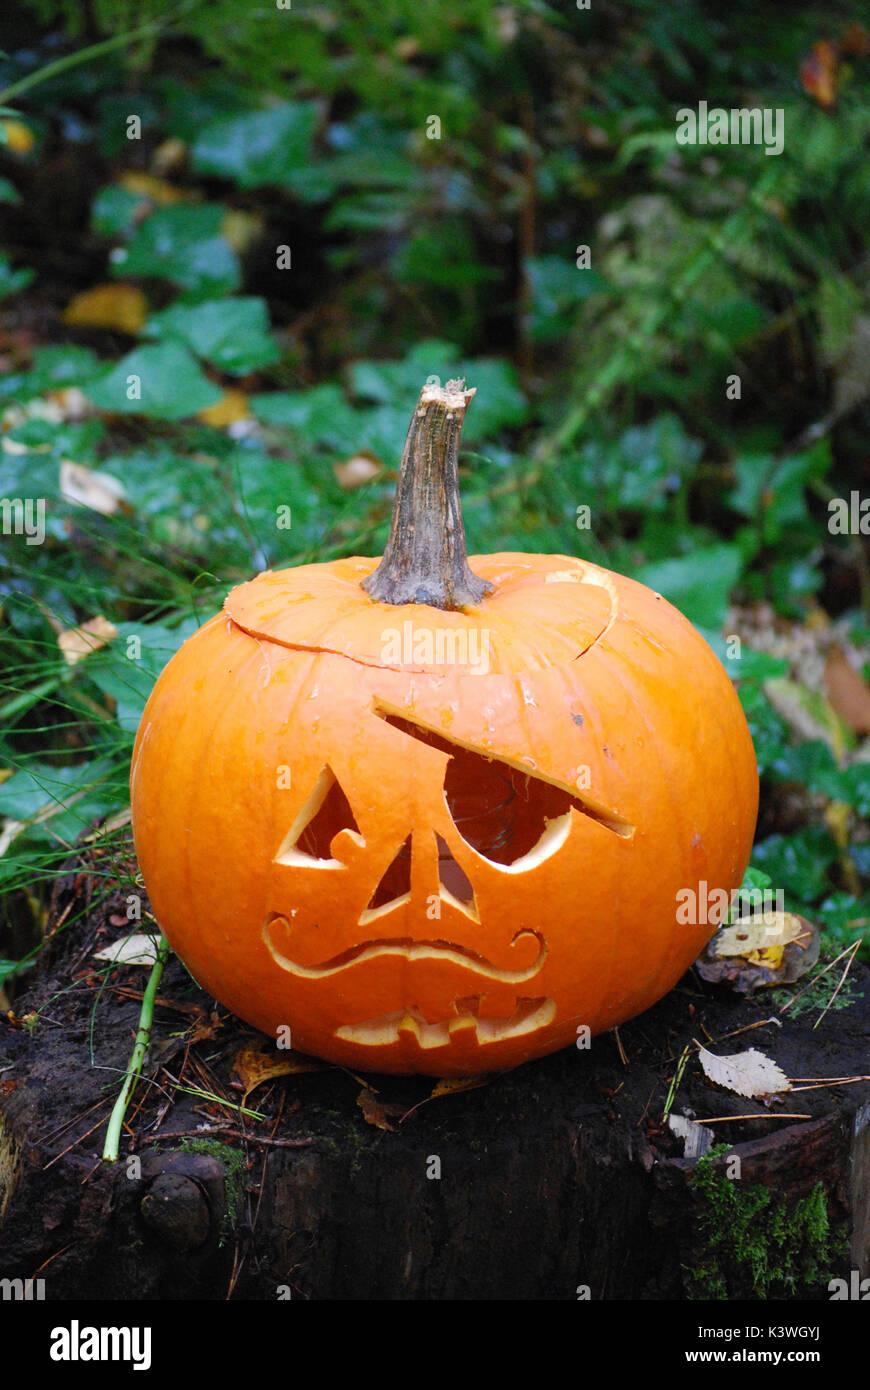 Kuerbis Schnitzen Pirat.Pirate Kurbis Halloween Jack O Lantern Stockfotografie Alamy